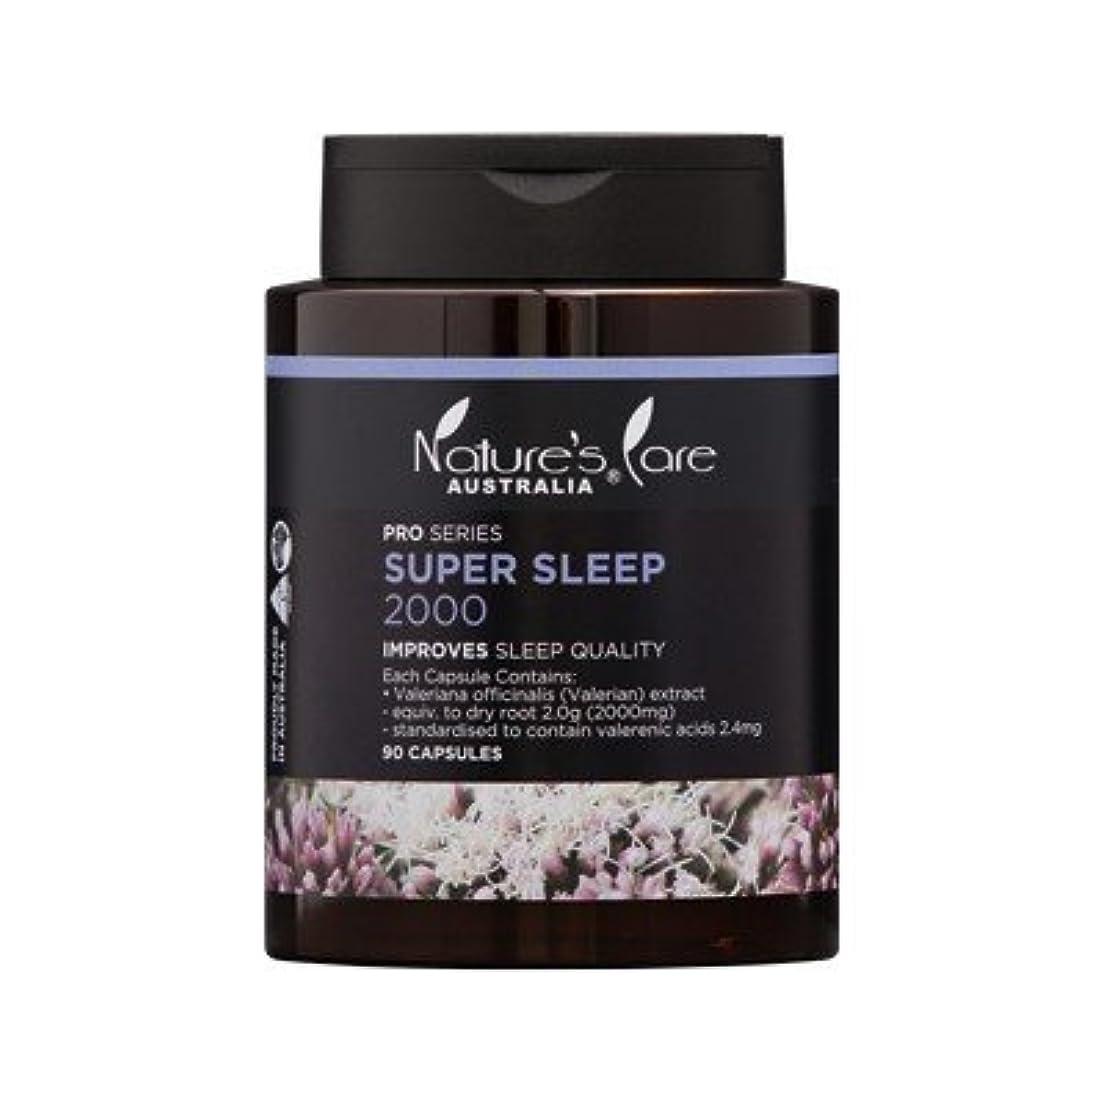 【Nature's Care】上質な睡眠をサポート☆Super Sleep スーパースリープ 2000mg 90カプセル入